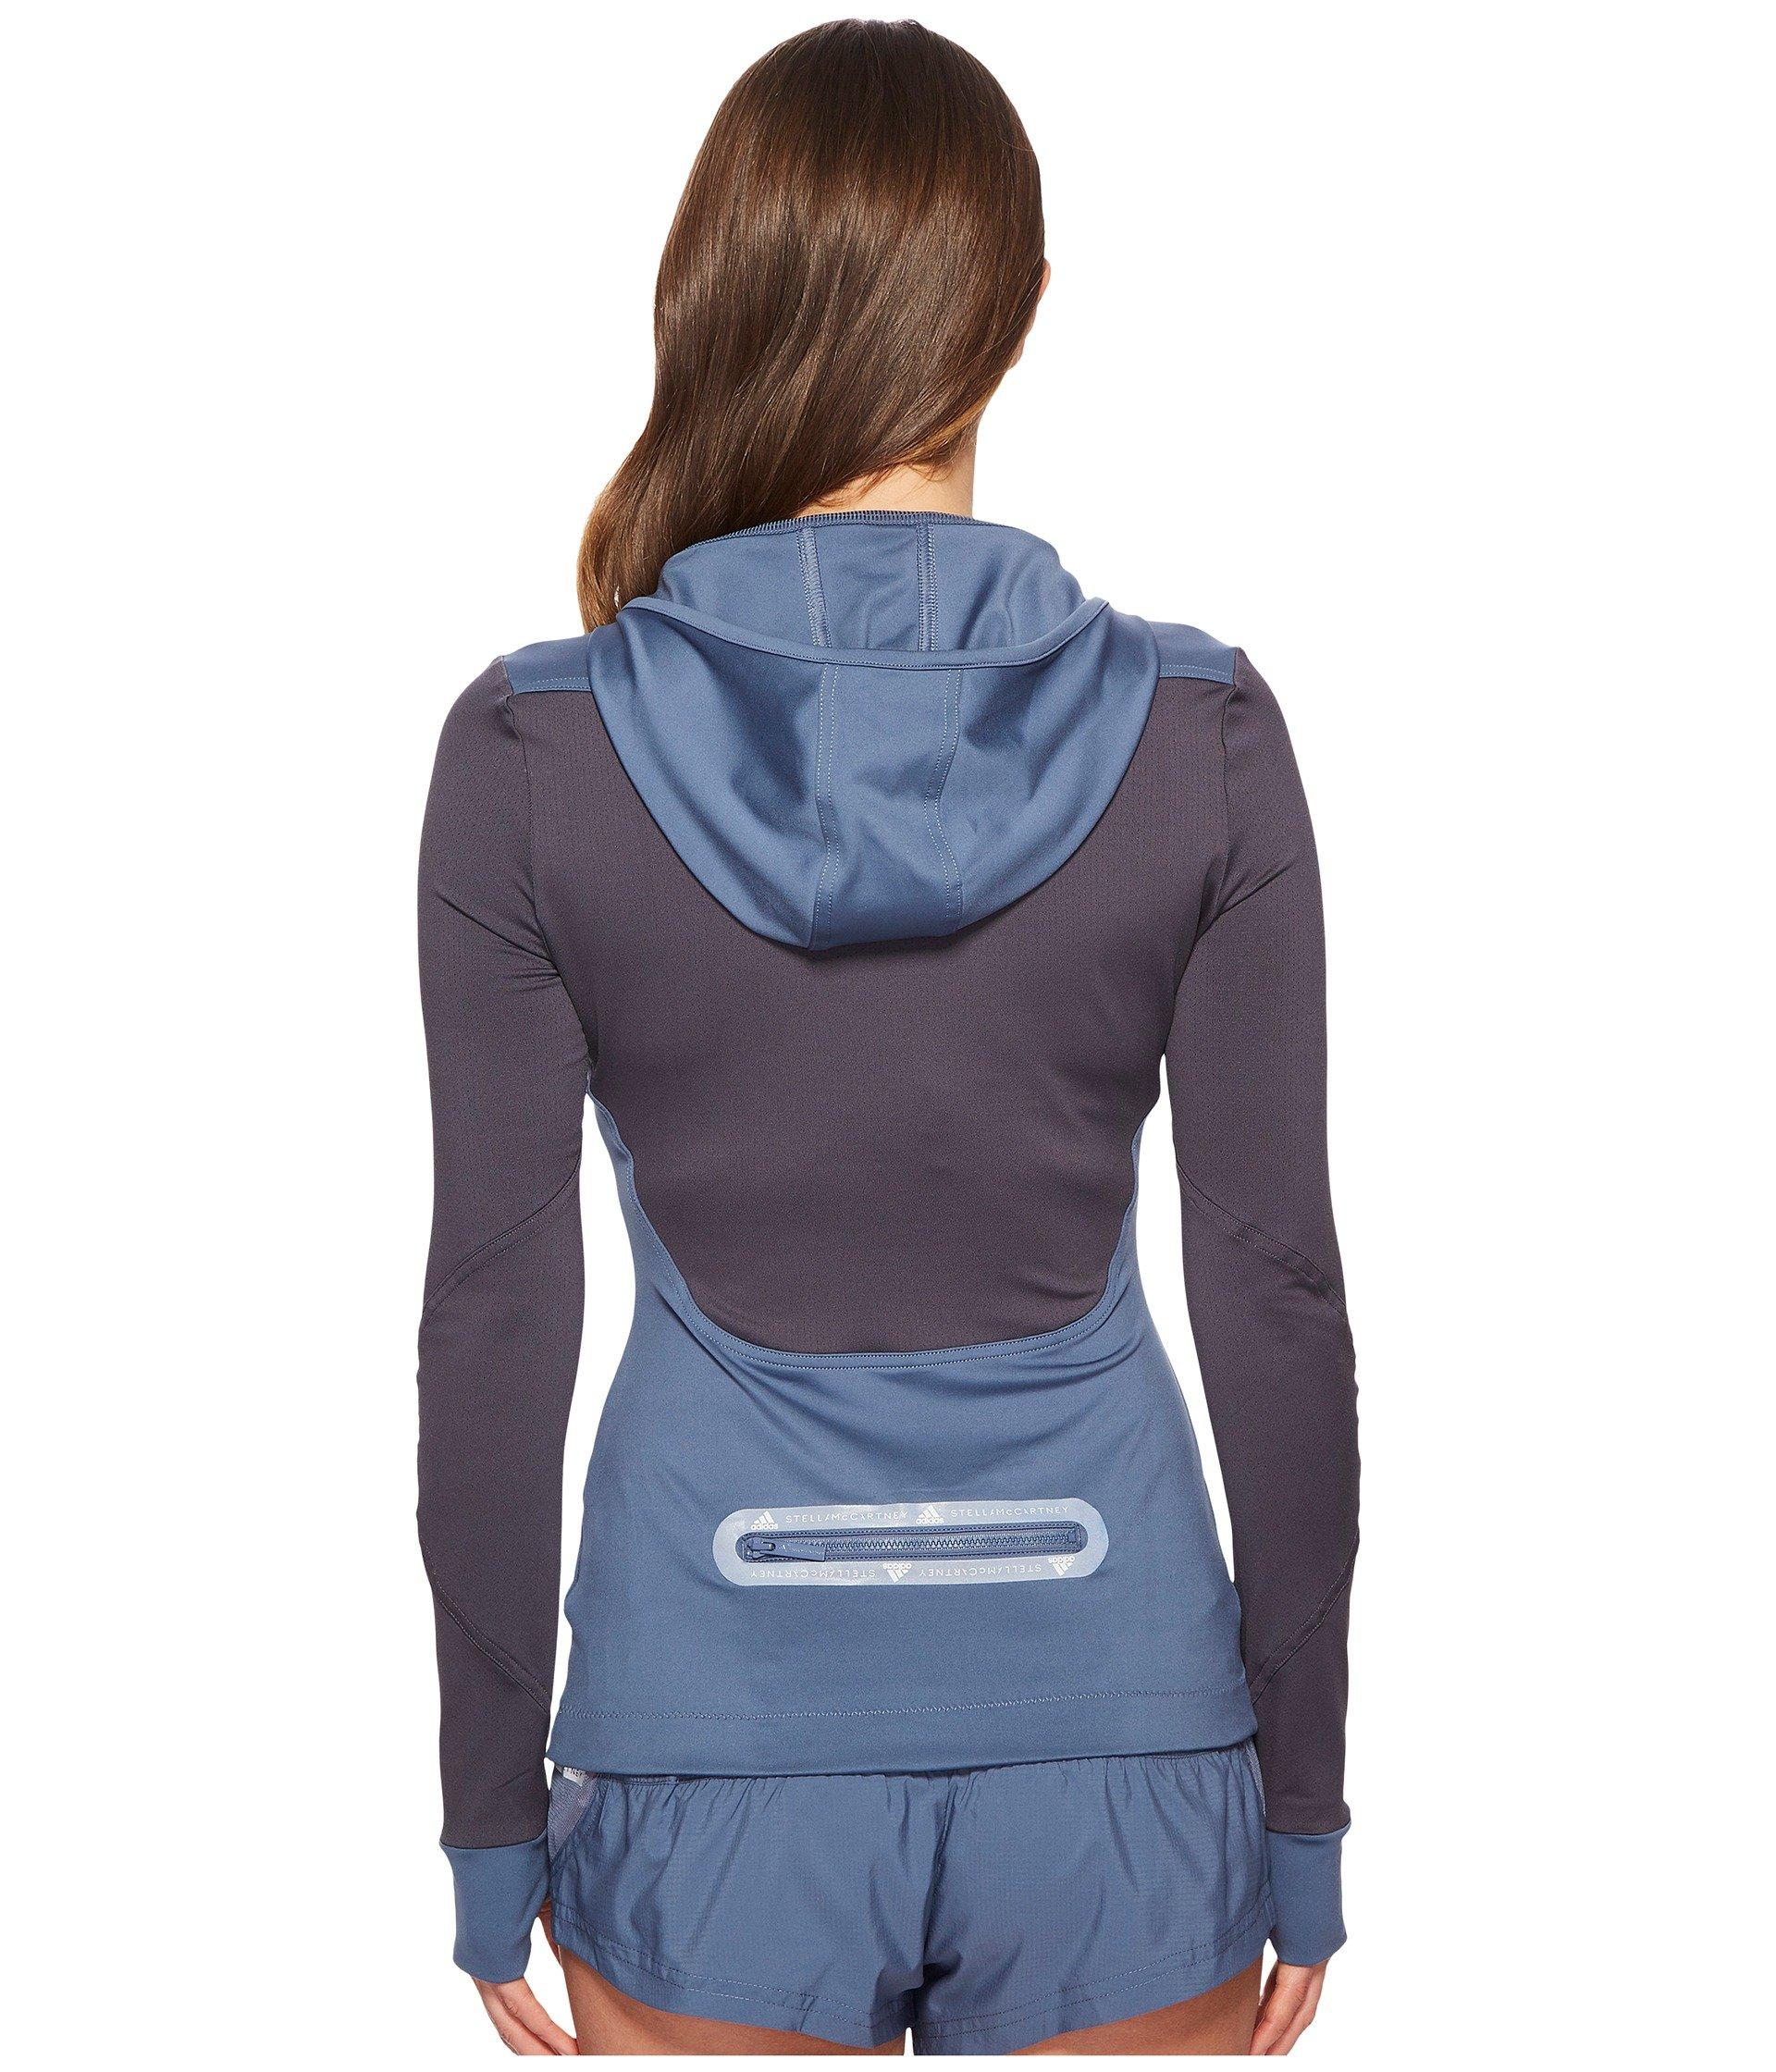 Ink Cg0137 Mccartney By Run Tech Hooded Long Adidas Stella Sleeve xwzB0nqq1F